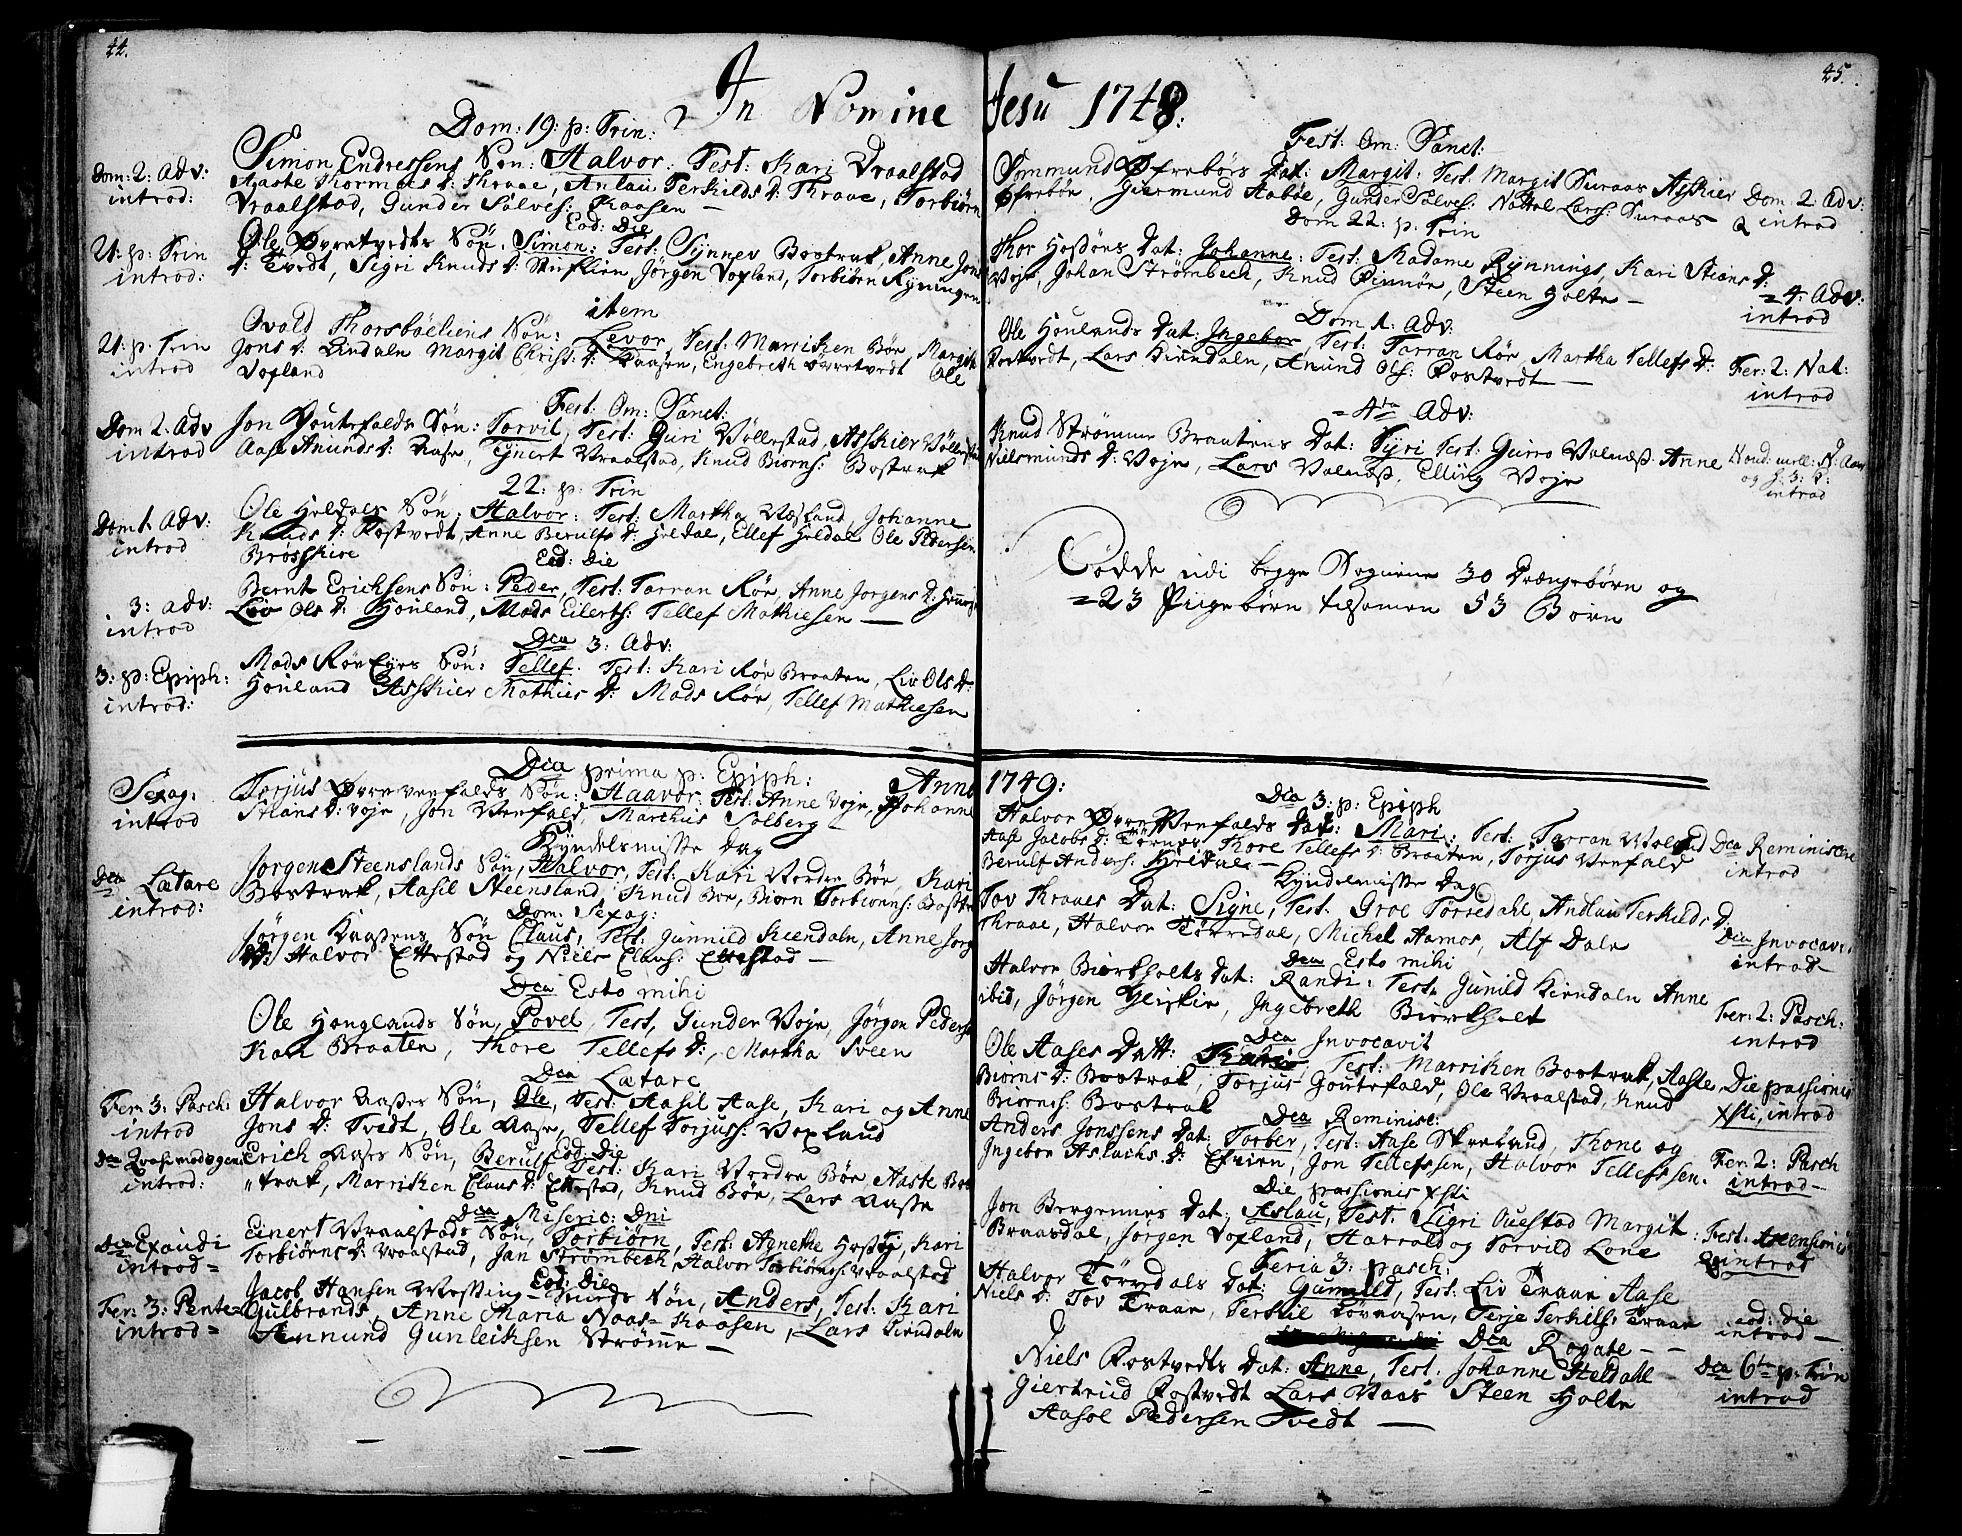 SAKO, Drangedal kirkebøker, F/Fa/L0001: Ministerialbok nr. 1, 1697-1767, s. 44-45